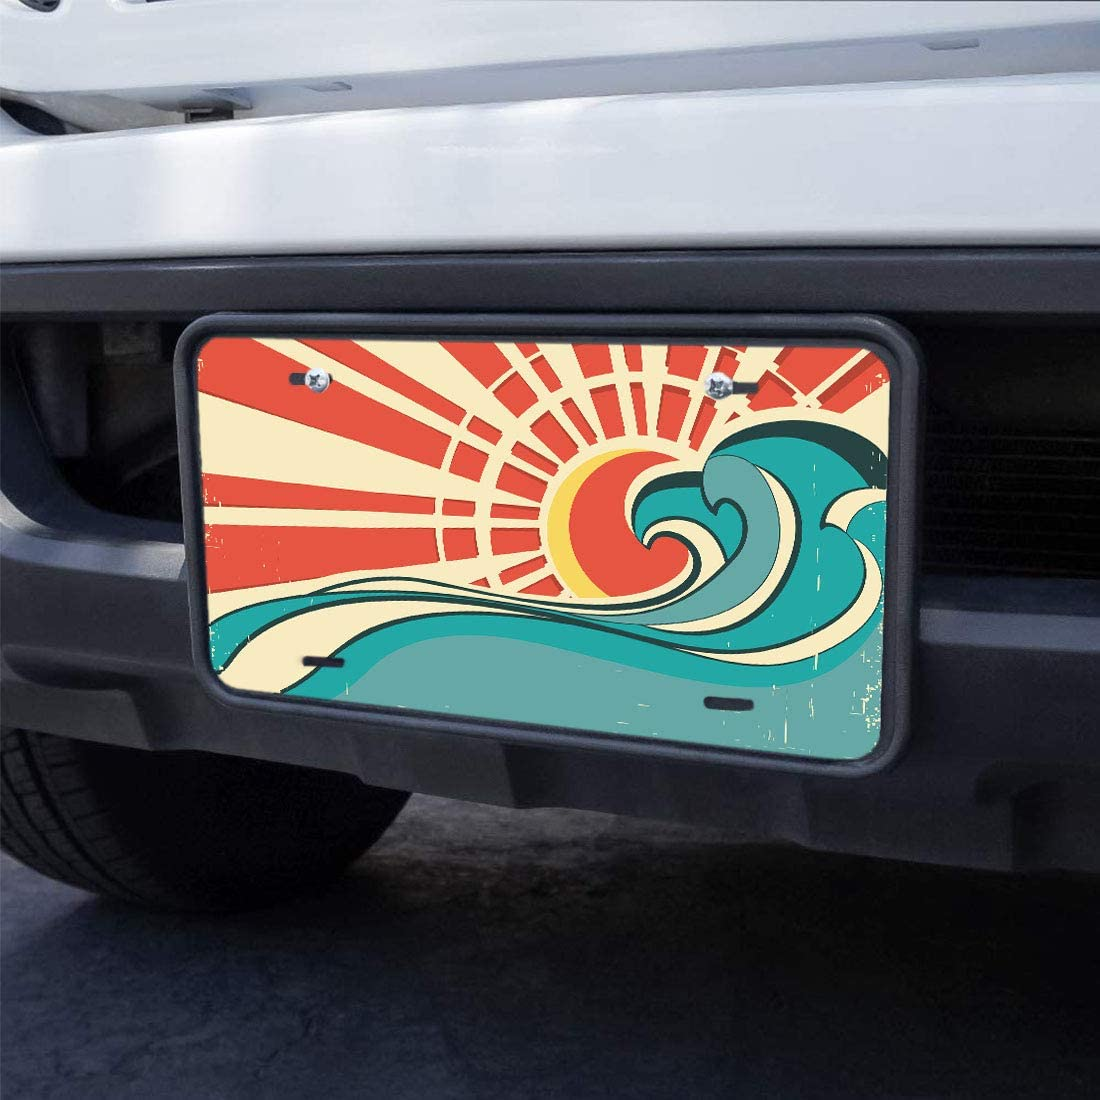 WONDERTIFY License Plate Colorado Tree Flag White Stripe Line Flag Decorative Car Front License Plate,Vanity Tag,Metal Car Plate,Aluminum Novelty License Plate for Men//Women//Boy//Girls Car,6 X 12 Inch